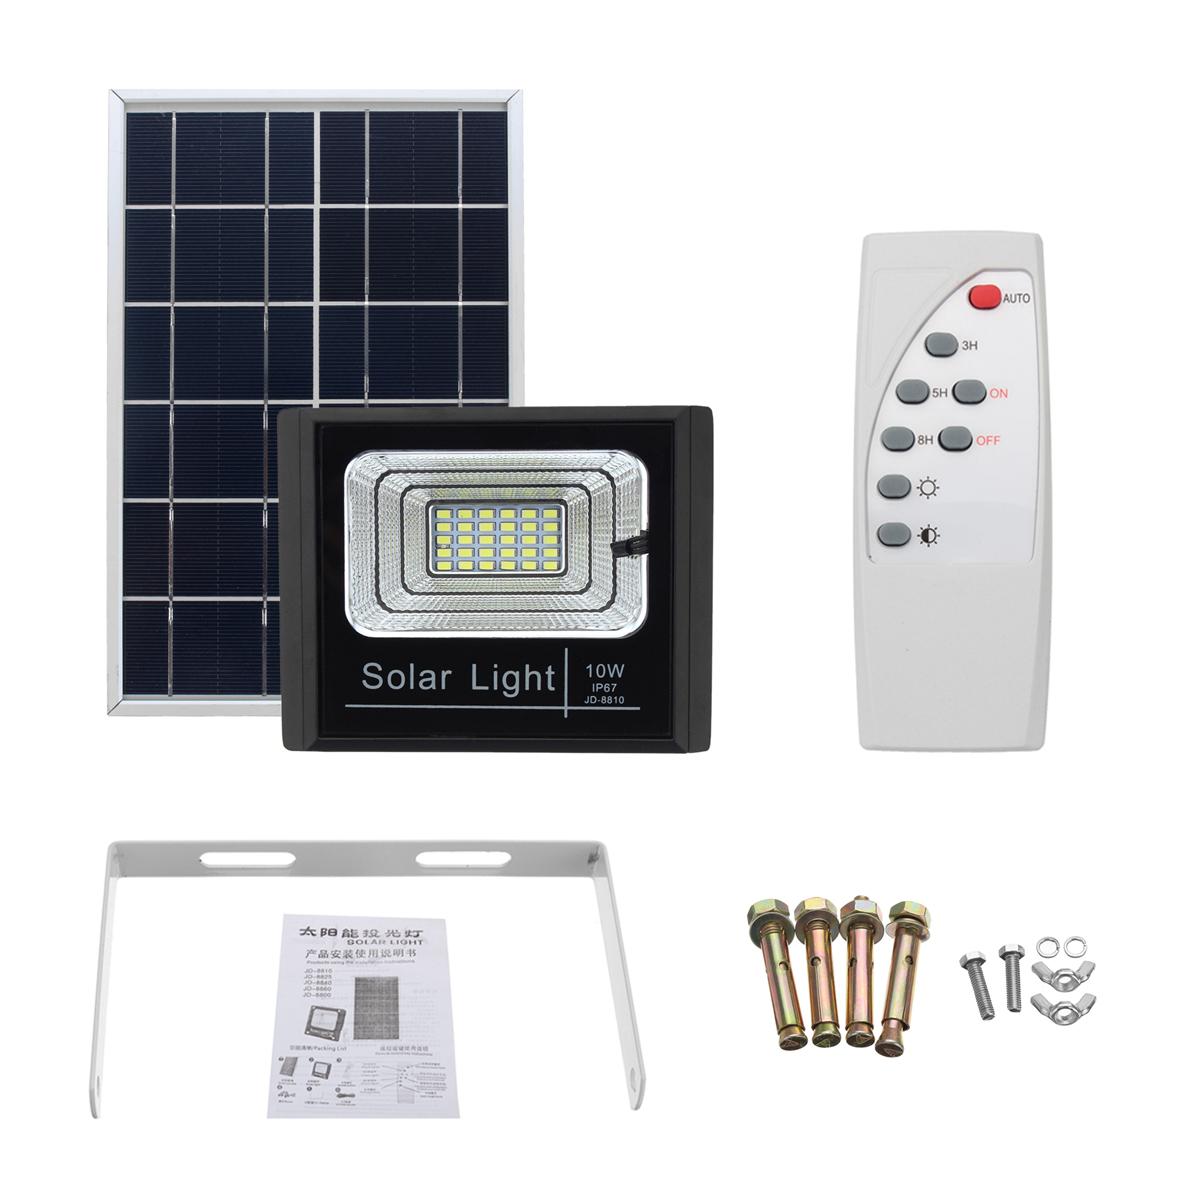 10W Waterproof Solar Power Panel Light Battery Charging Lamp Remote Control Outdoor Yard Lantern